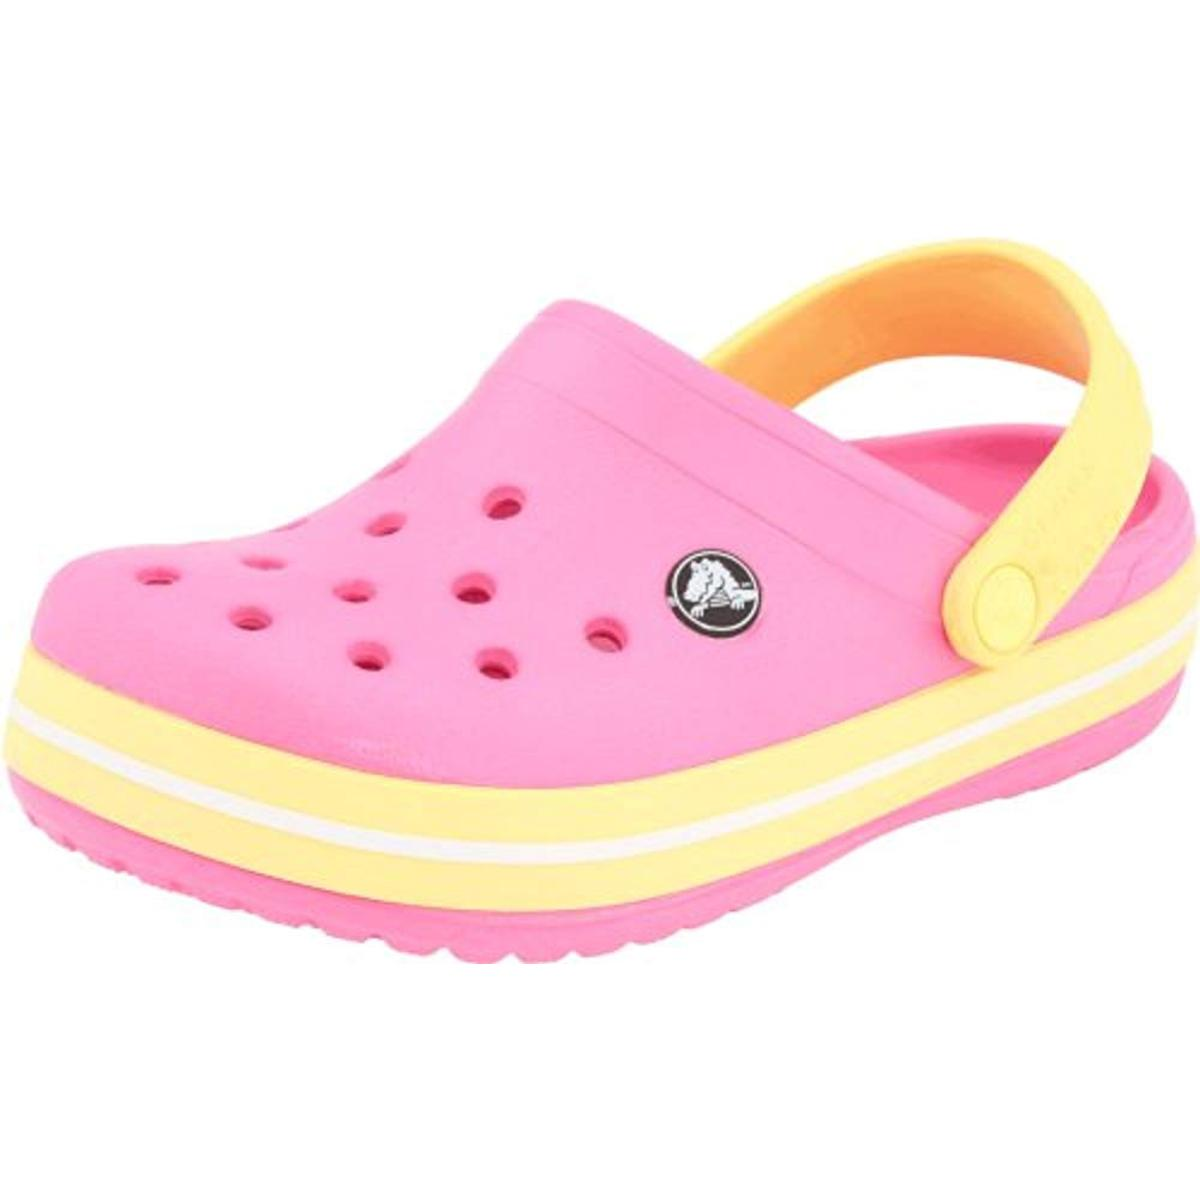 Crocs Unisex Kids Crocband Croslite Clog Shoes 0